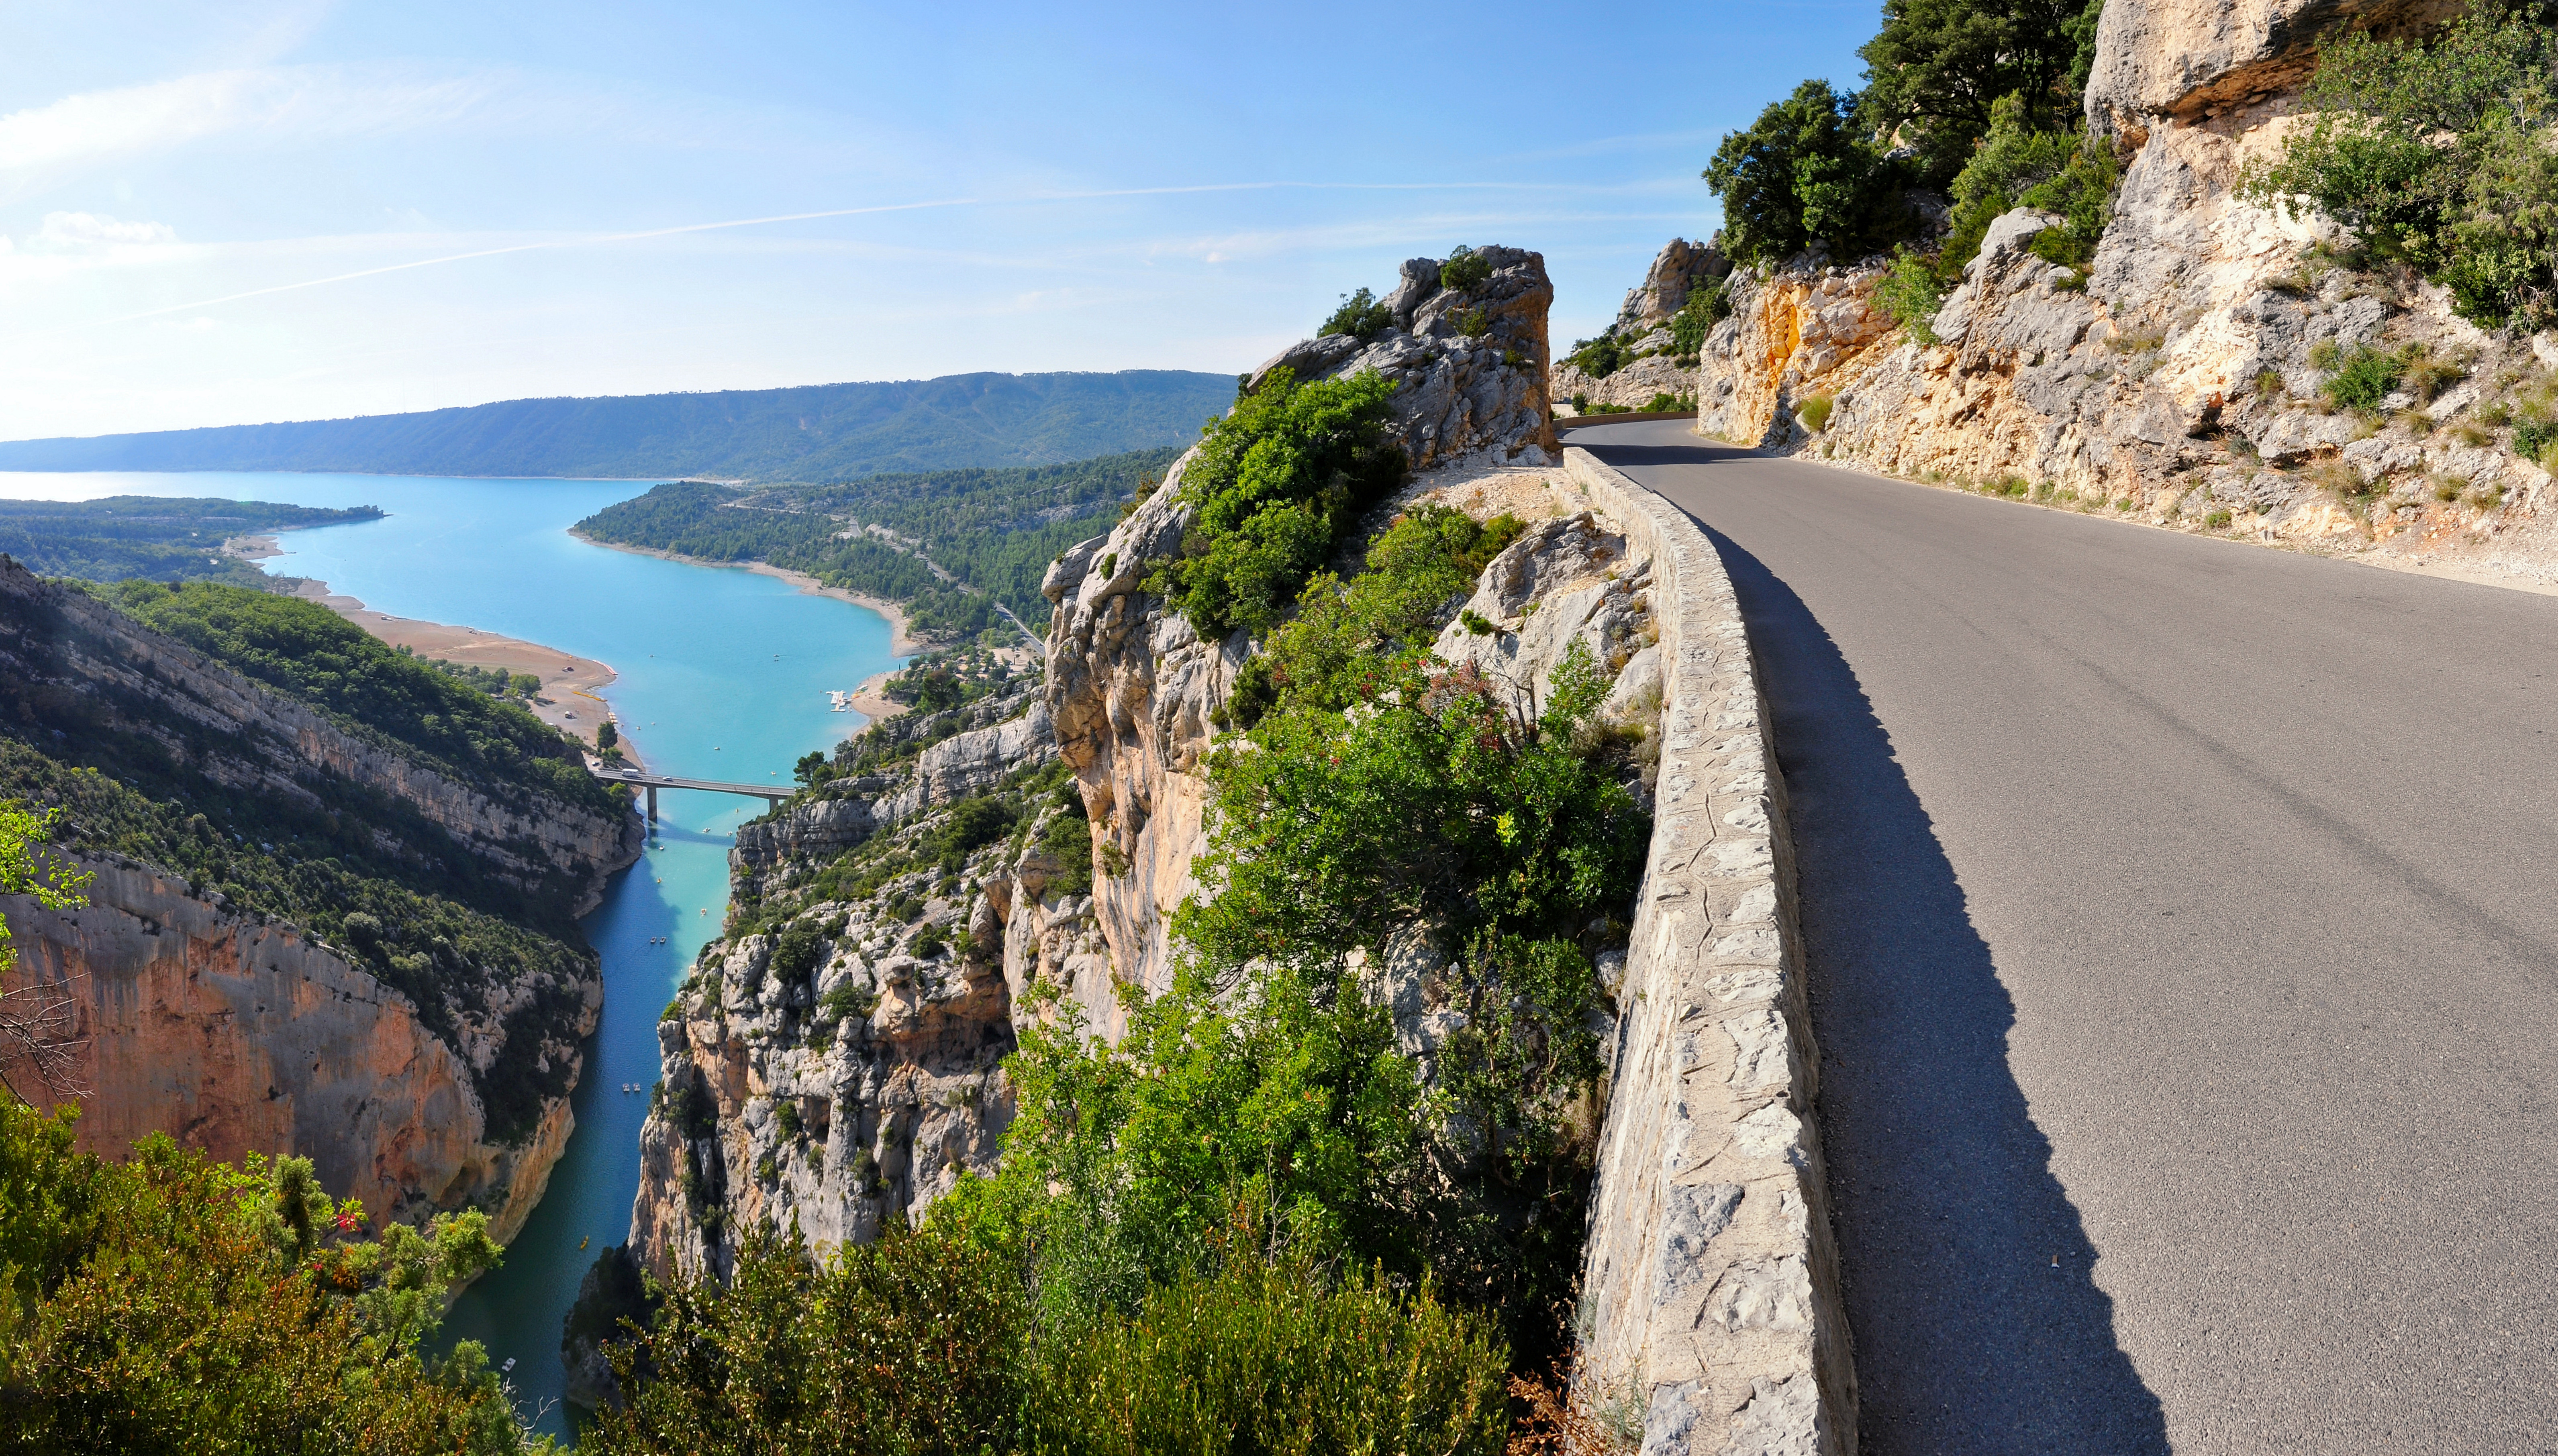 12 Truly Astonishing Road Trips